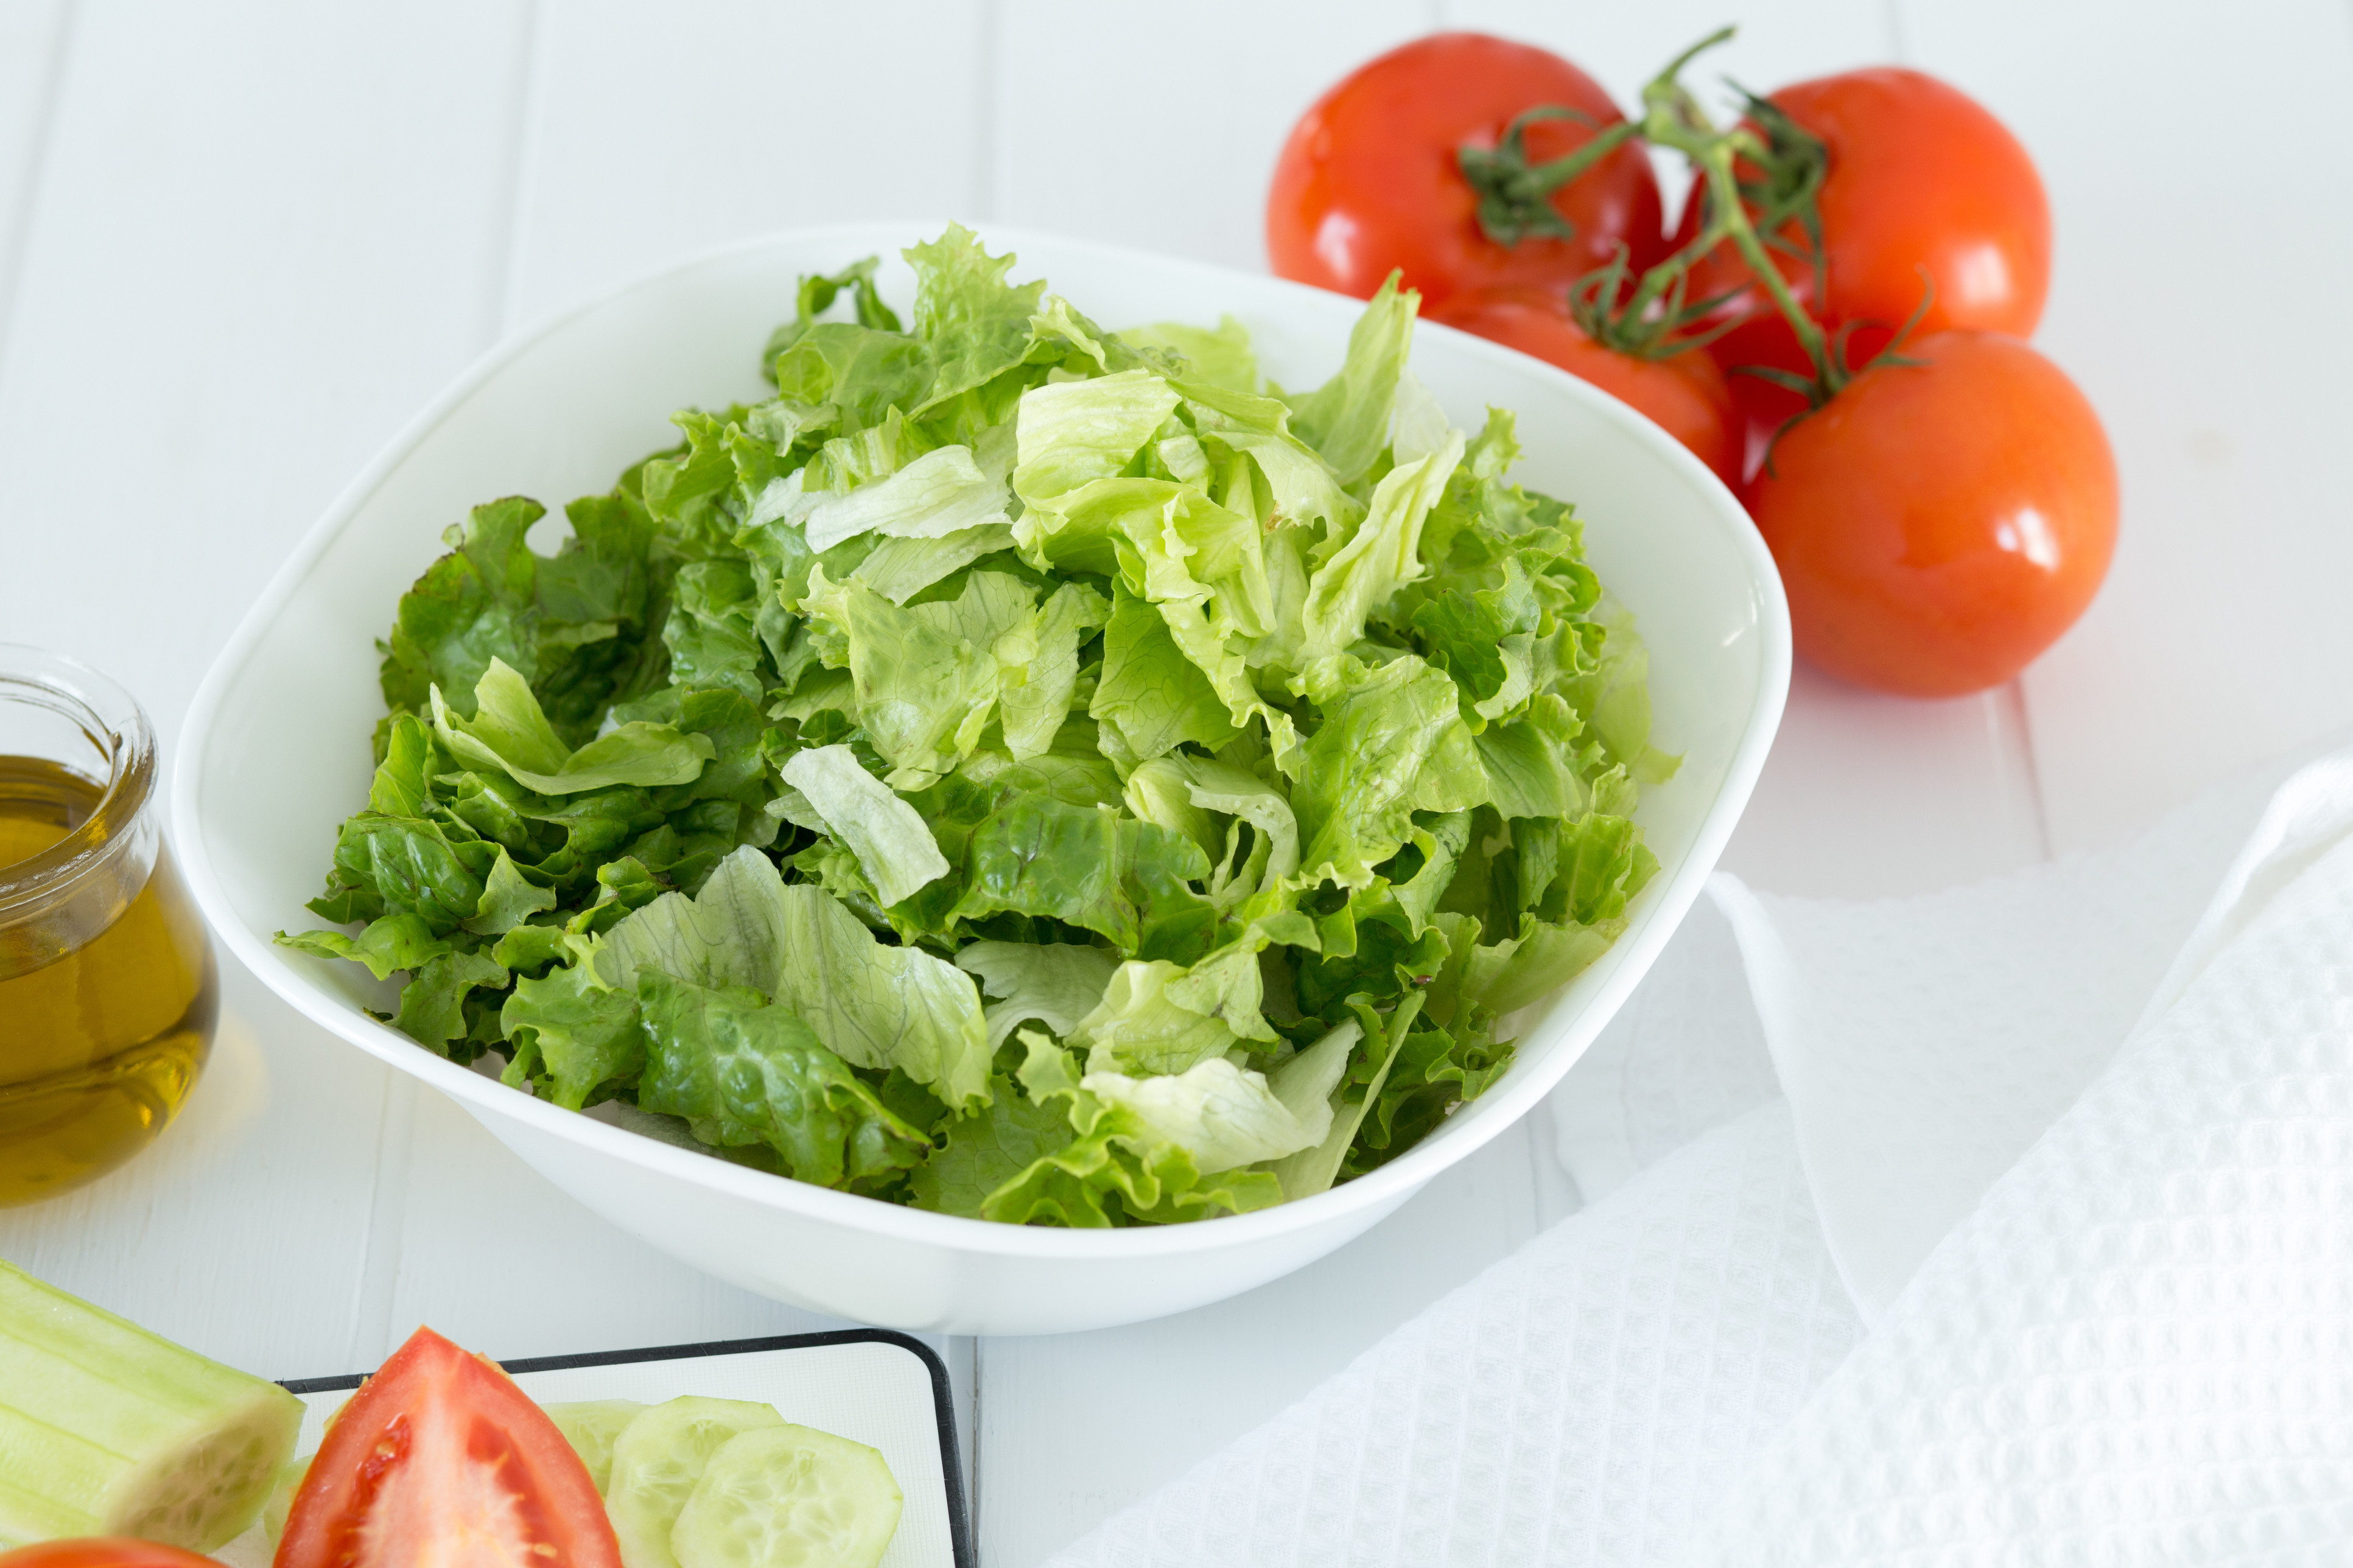 cut lettuce salad